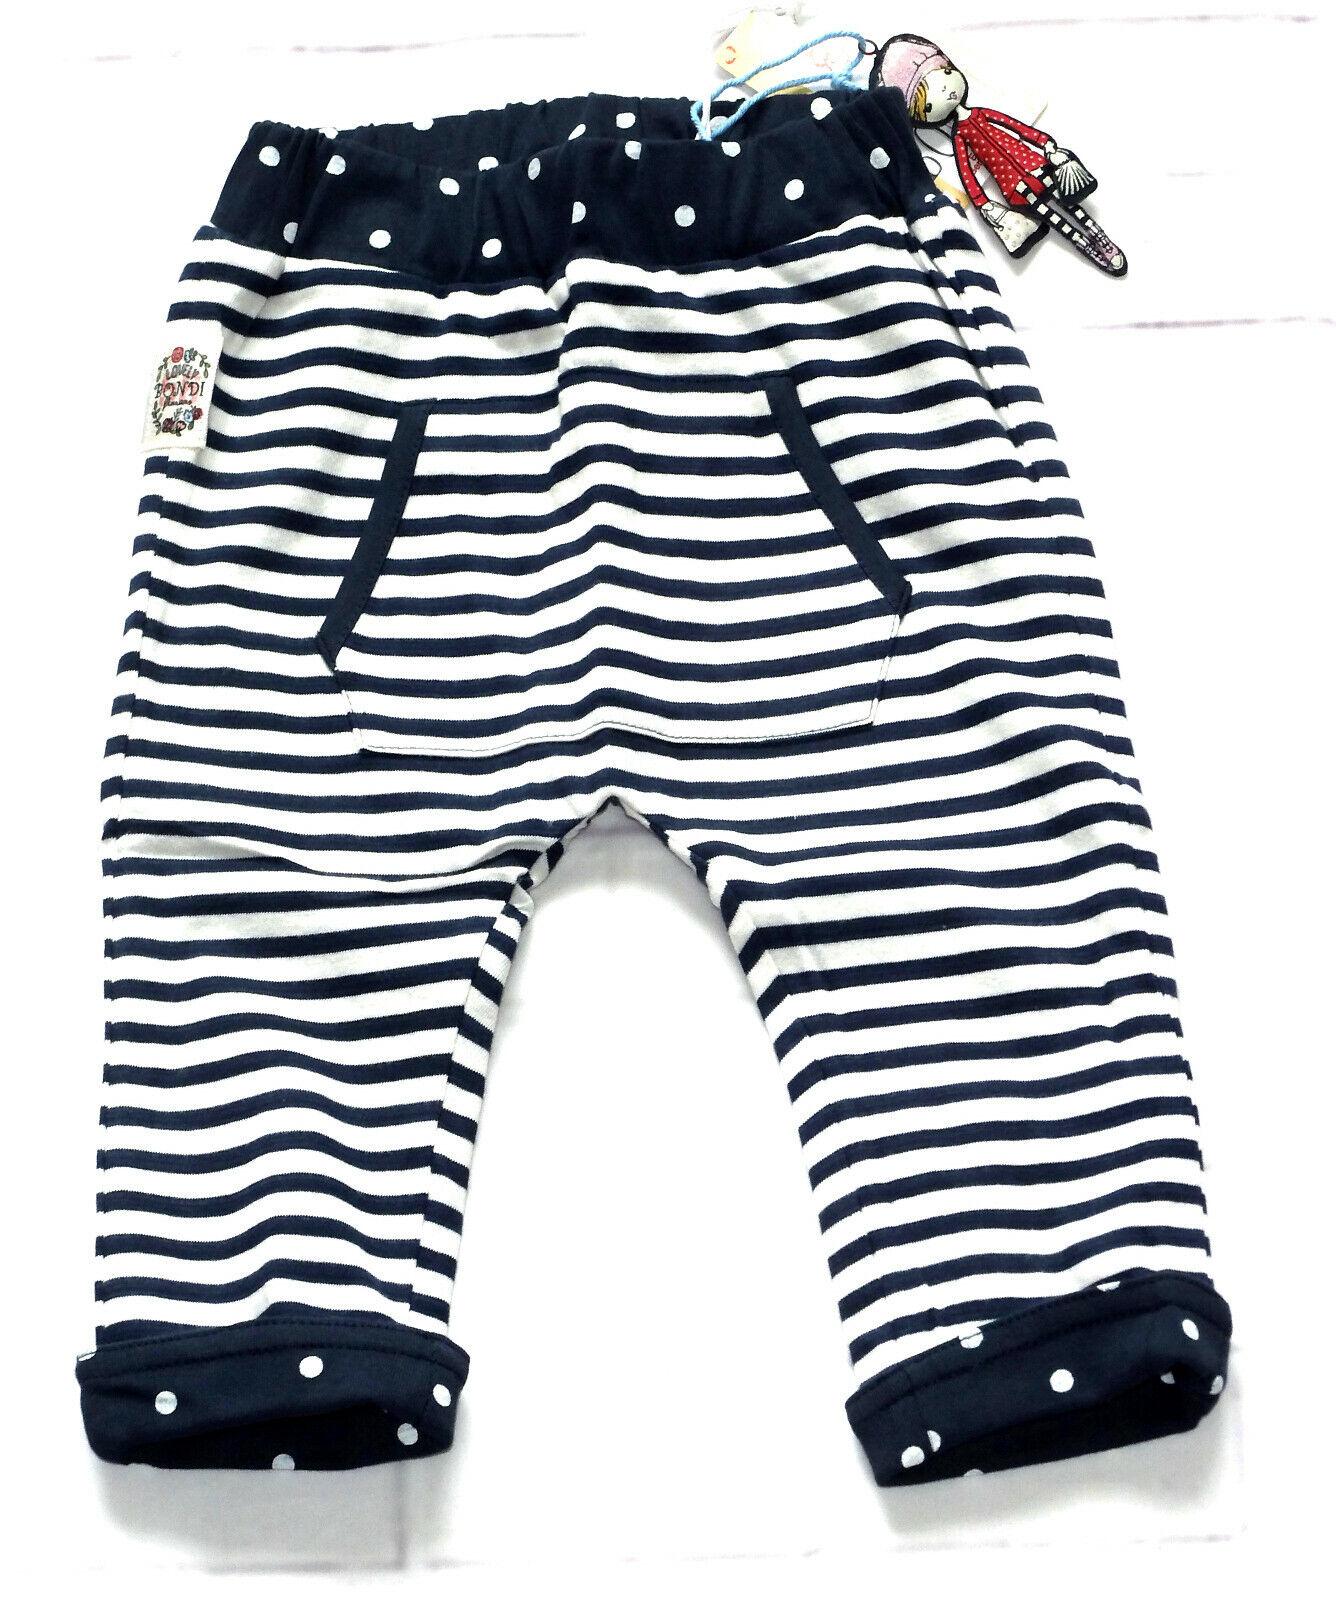 Bondi Wendehose Baby Mädchen Hose Leggings Schlupfhose Stripe  Gr. 68 80 86 NeU